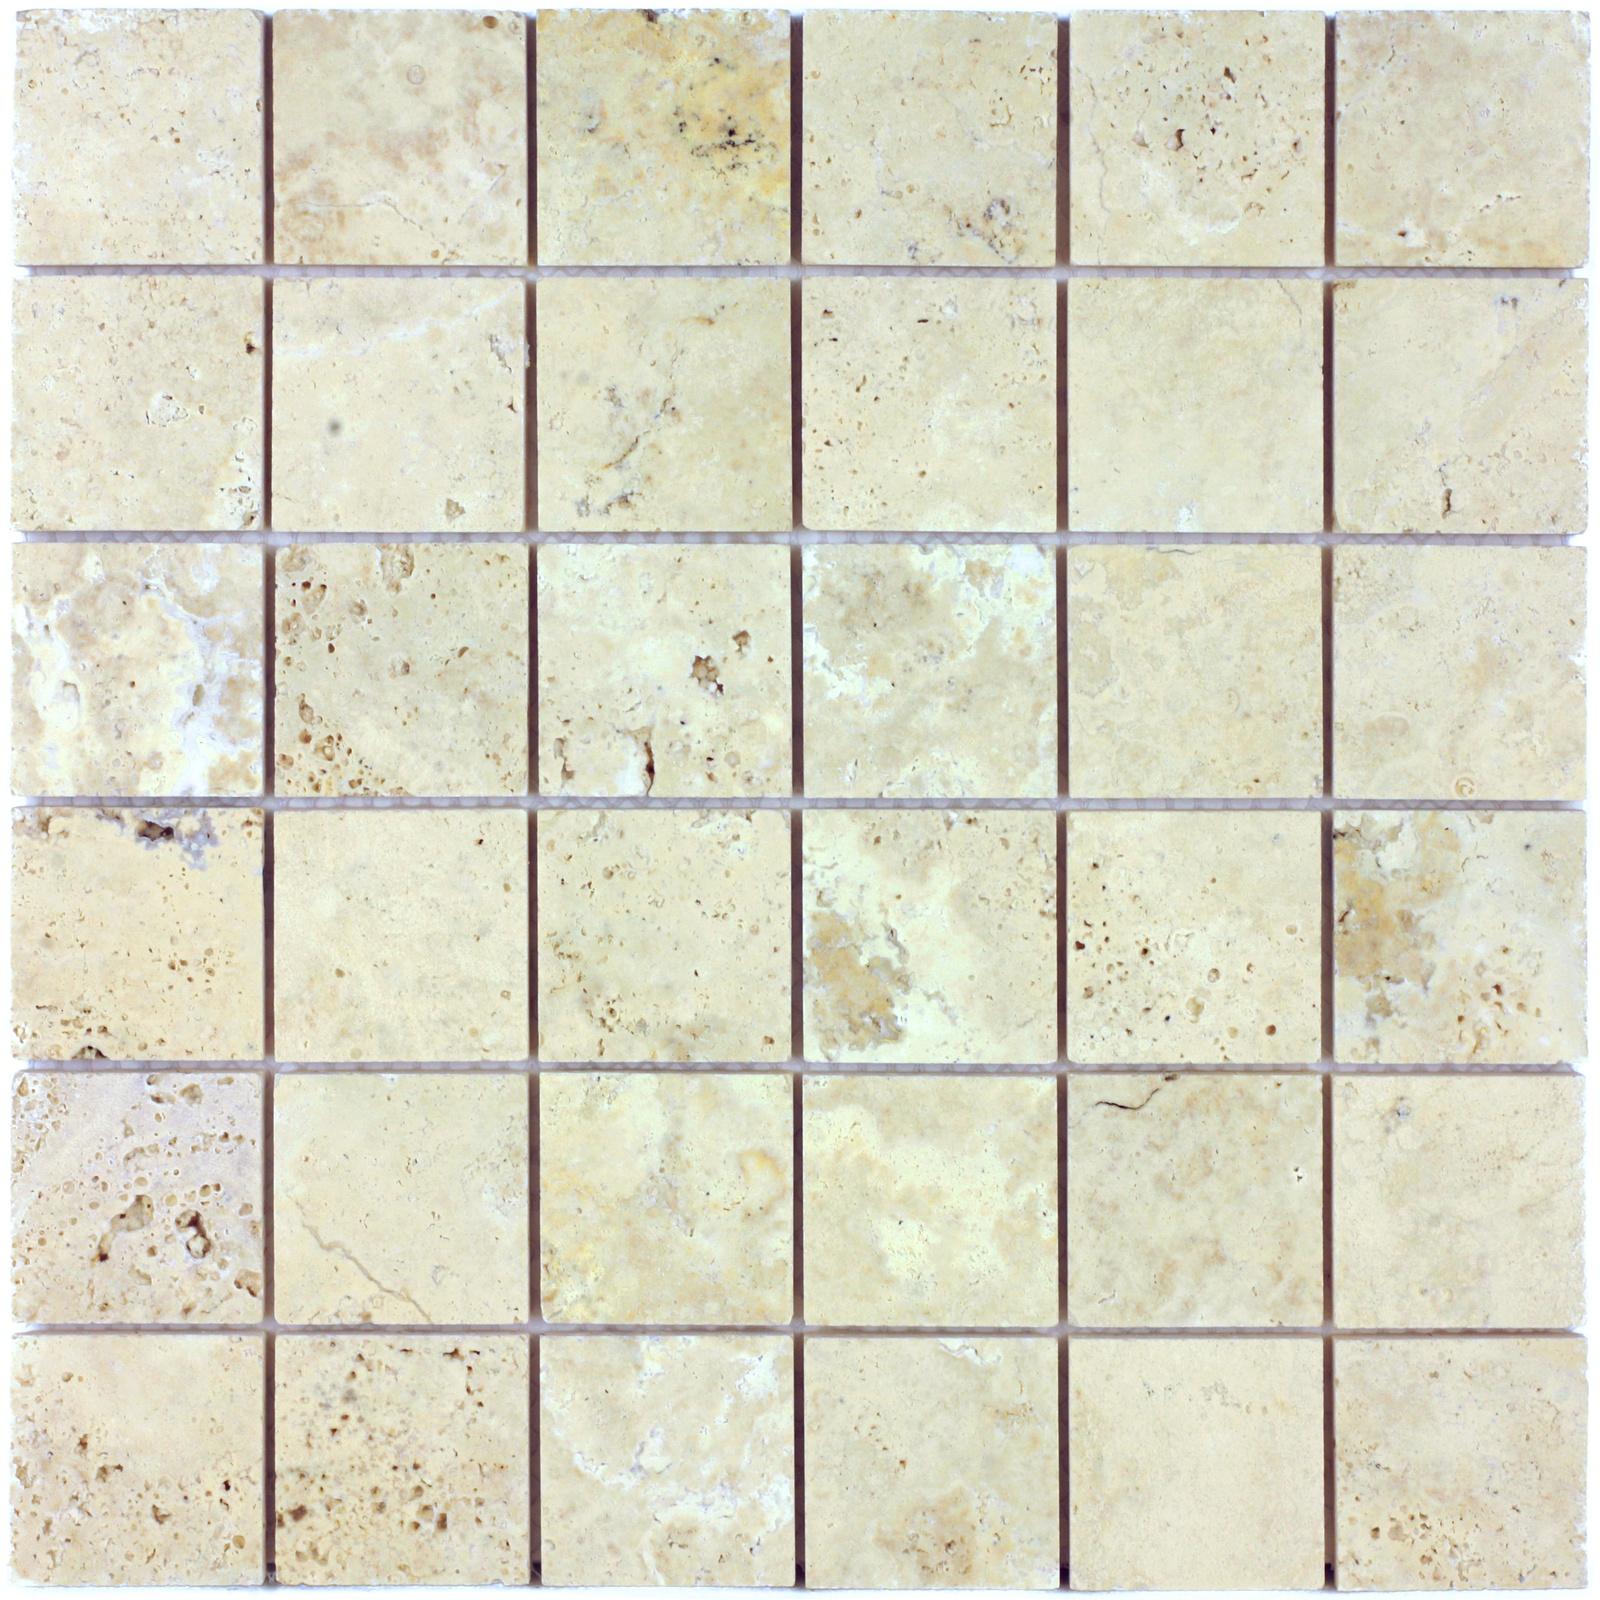 Мозаика из натурального камня Travertino Etrusco POL 48x48x7 цена